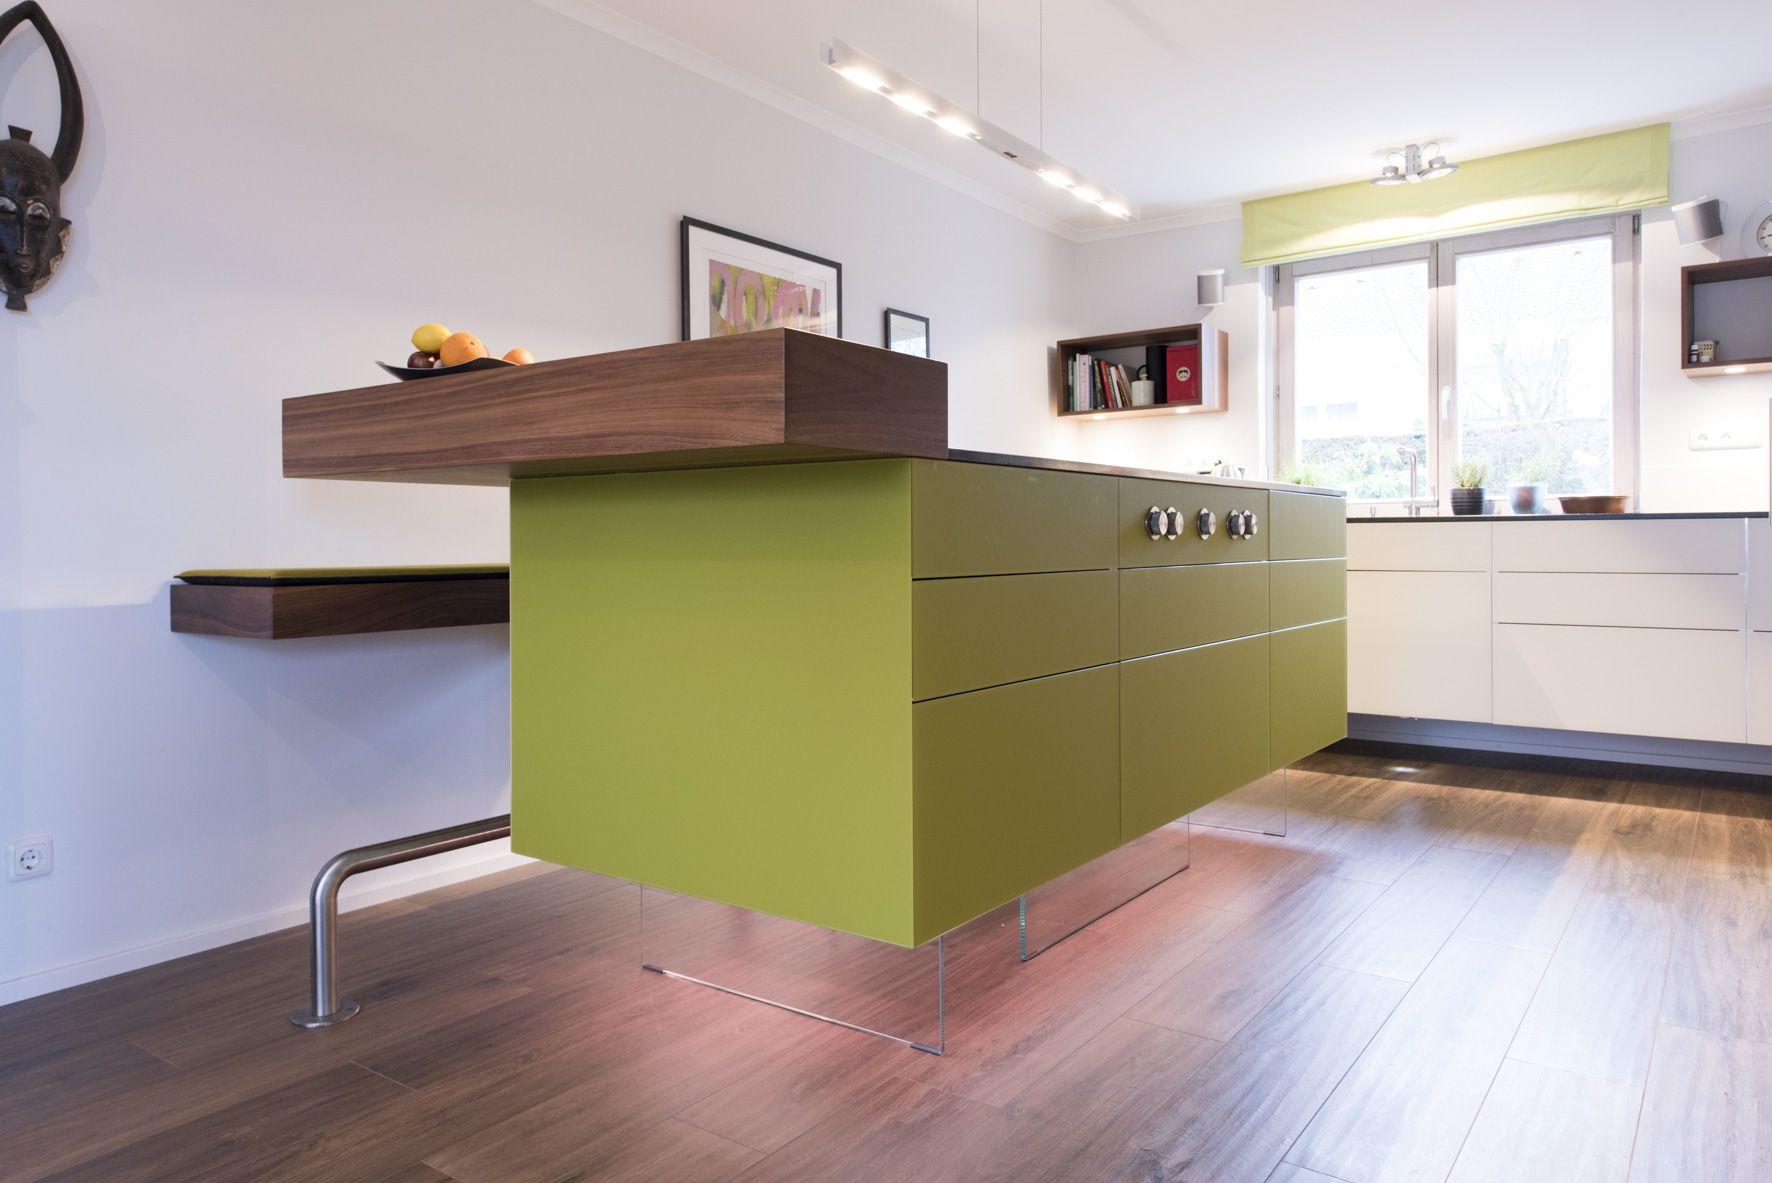 sitzbank kche holz cheap medium size of modernes cooles sitzbank aus holz selber bauen planen. Black Bedroom Furniture Sets. Home Design Ideas